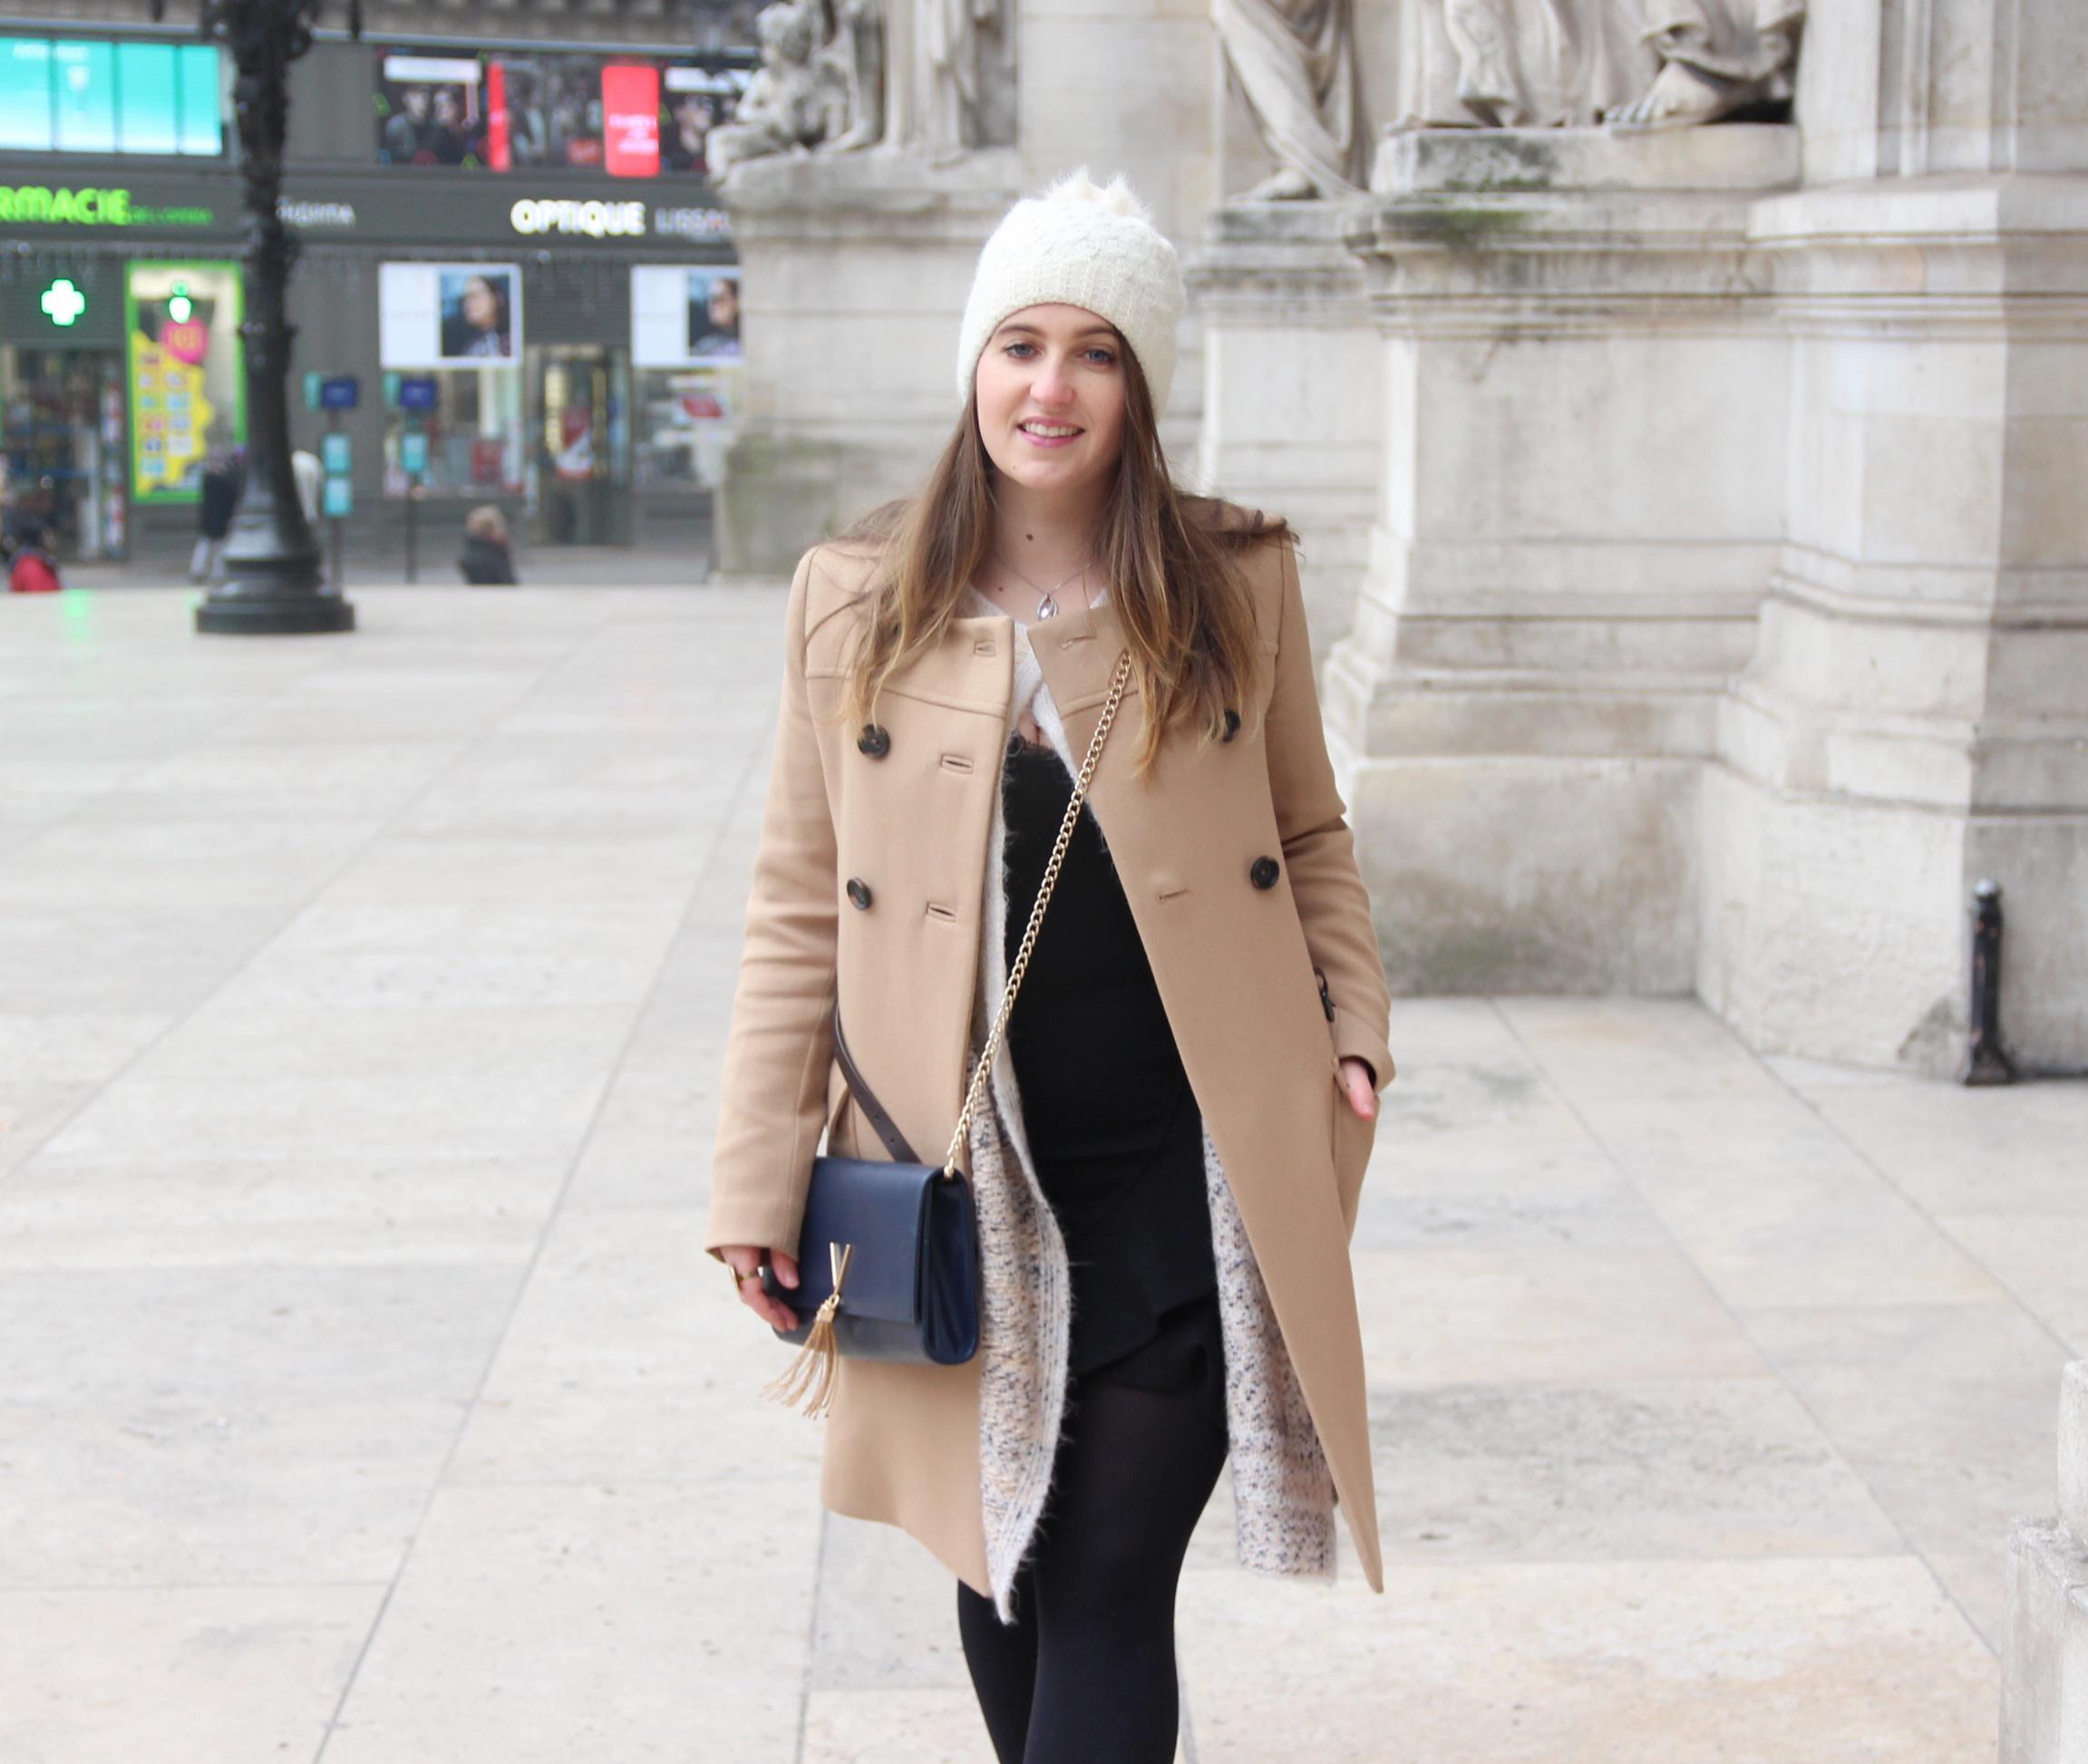 paris-opera-garnier-winter-day-influencer-style-personalstylist-imageconsultant-seralynepointcom-img_6646